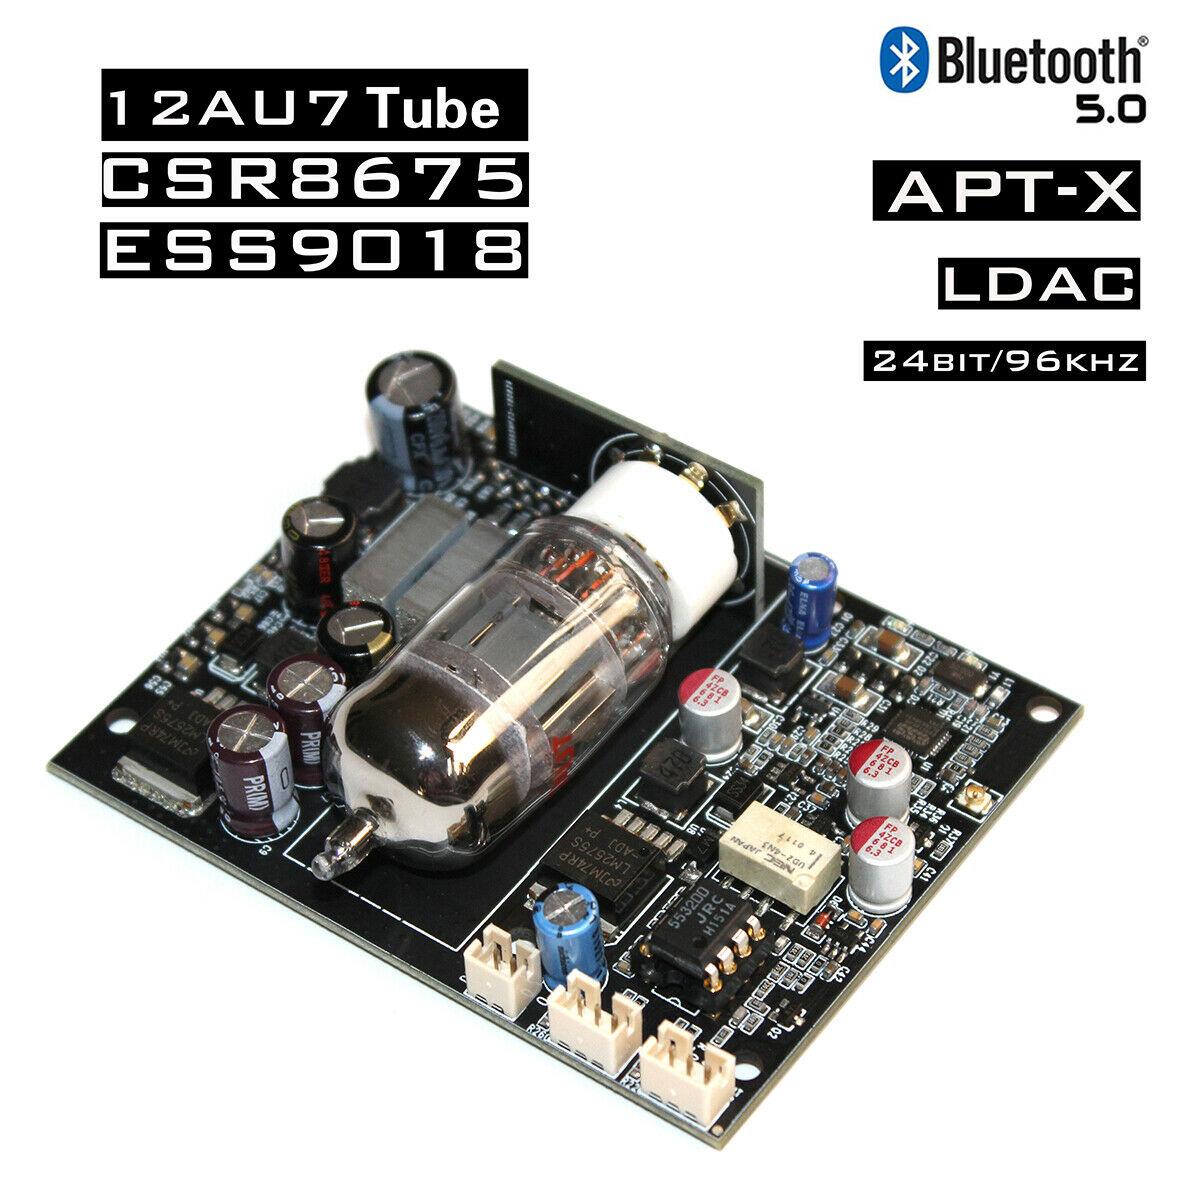 12AU7 Tubo CSR8675 Bluetooth Audio Ricevitore Bordo ES9018 Decodifica DAC APTX 24bit12AU7 Tubo CSR8675 Bluetooth Audio Ricevitore Bordo ES9018 Decodifica DAC APTX 24bit